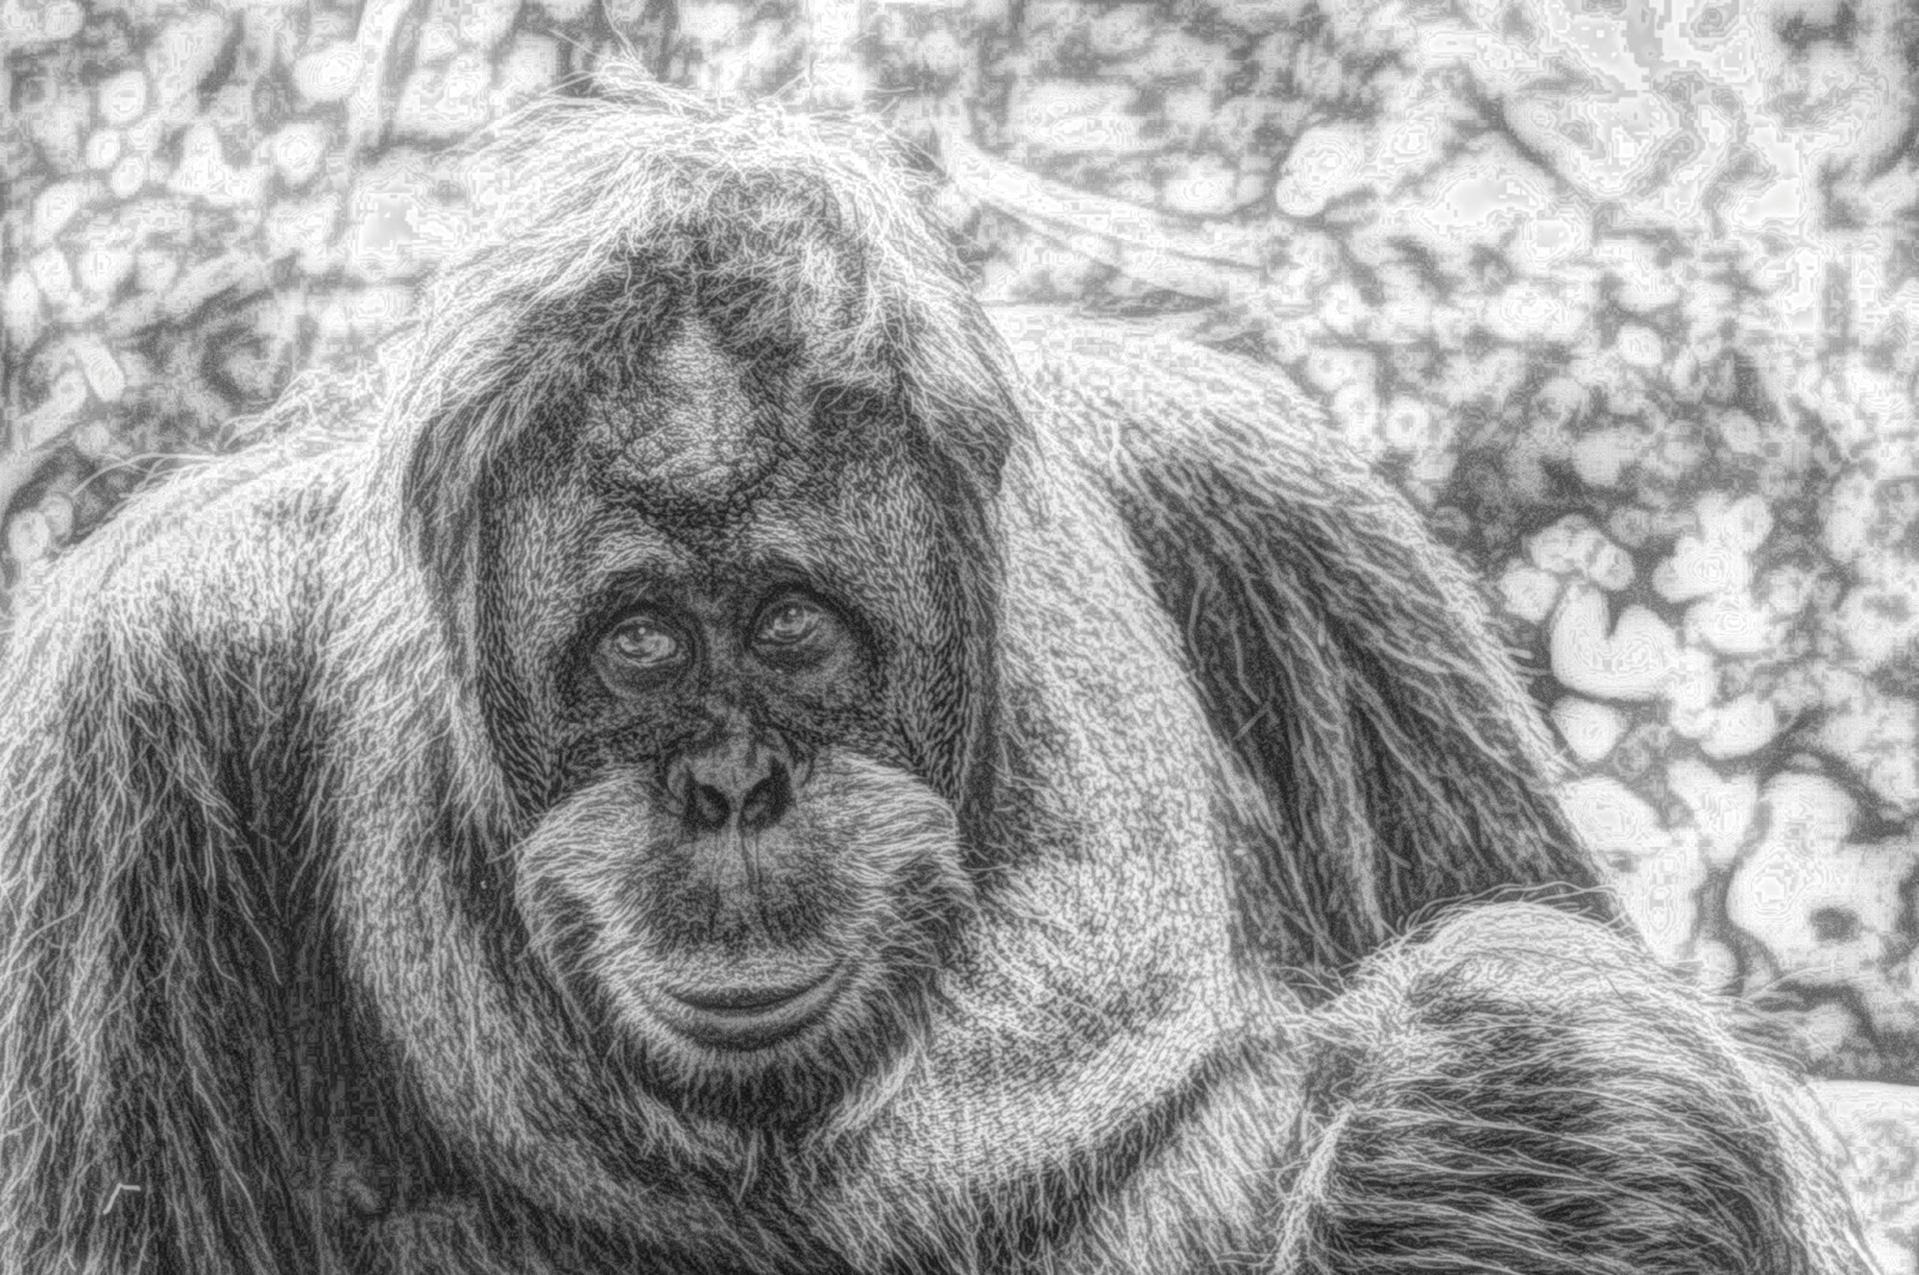 free picture  art  draw  monochrome  portrait  animal